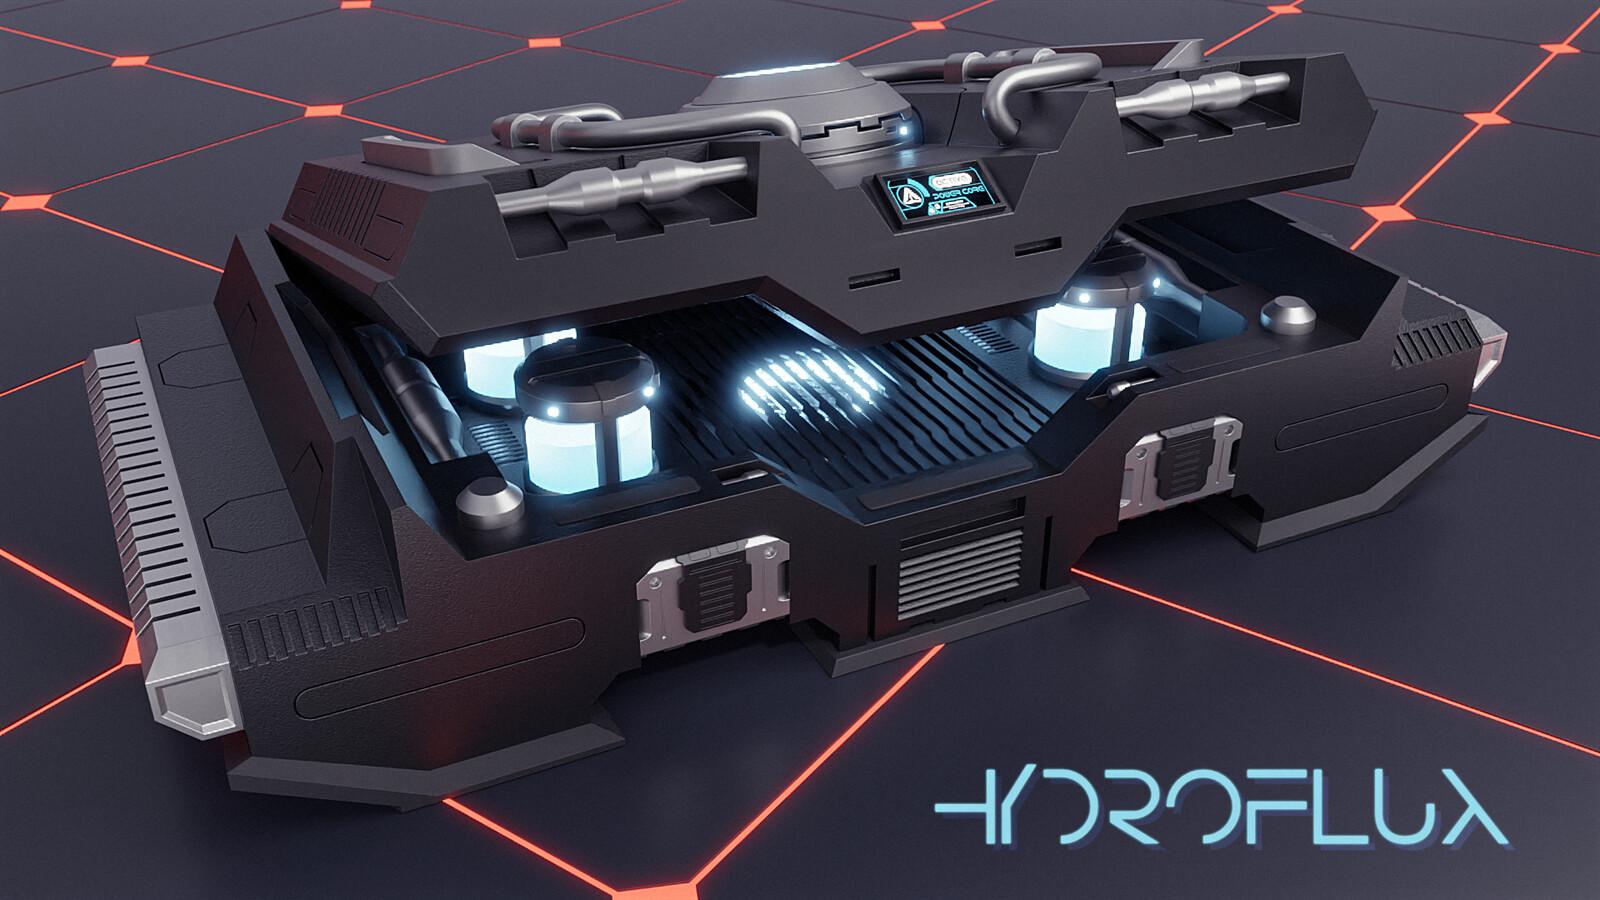 Hydroflux energy core transporter for recharging carryable capacitators.